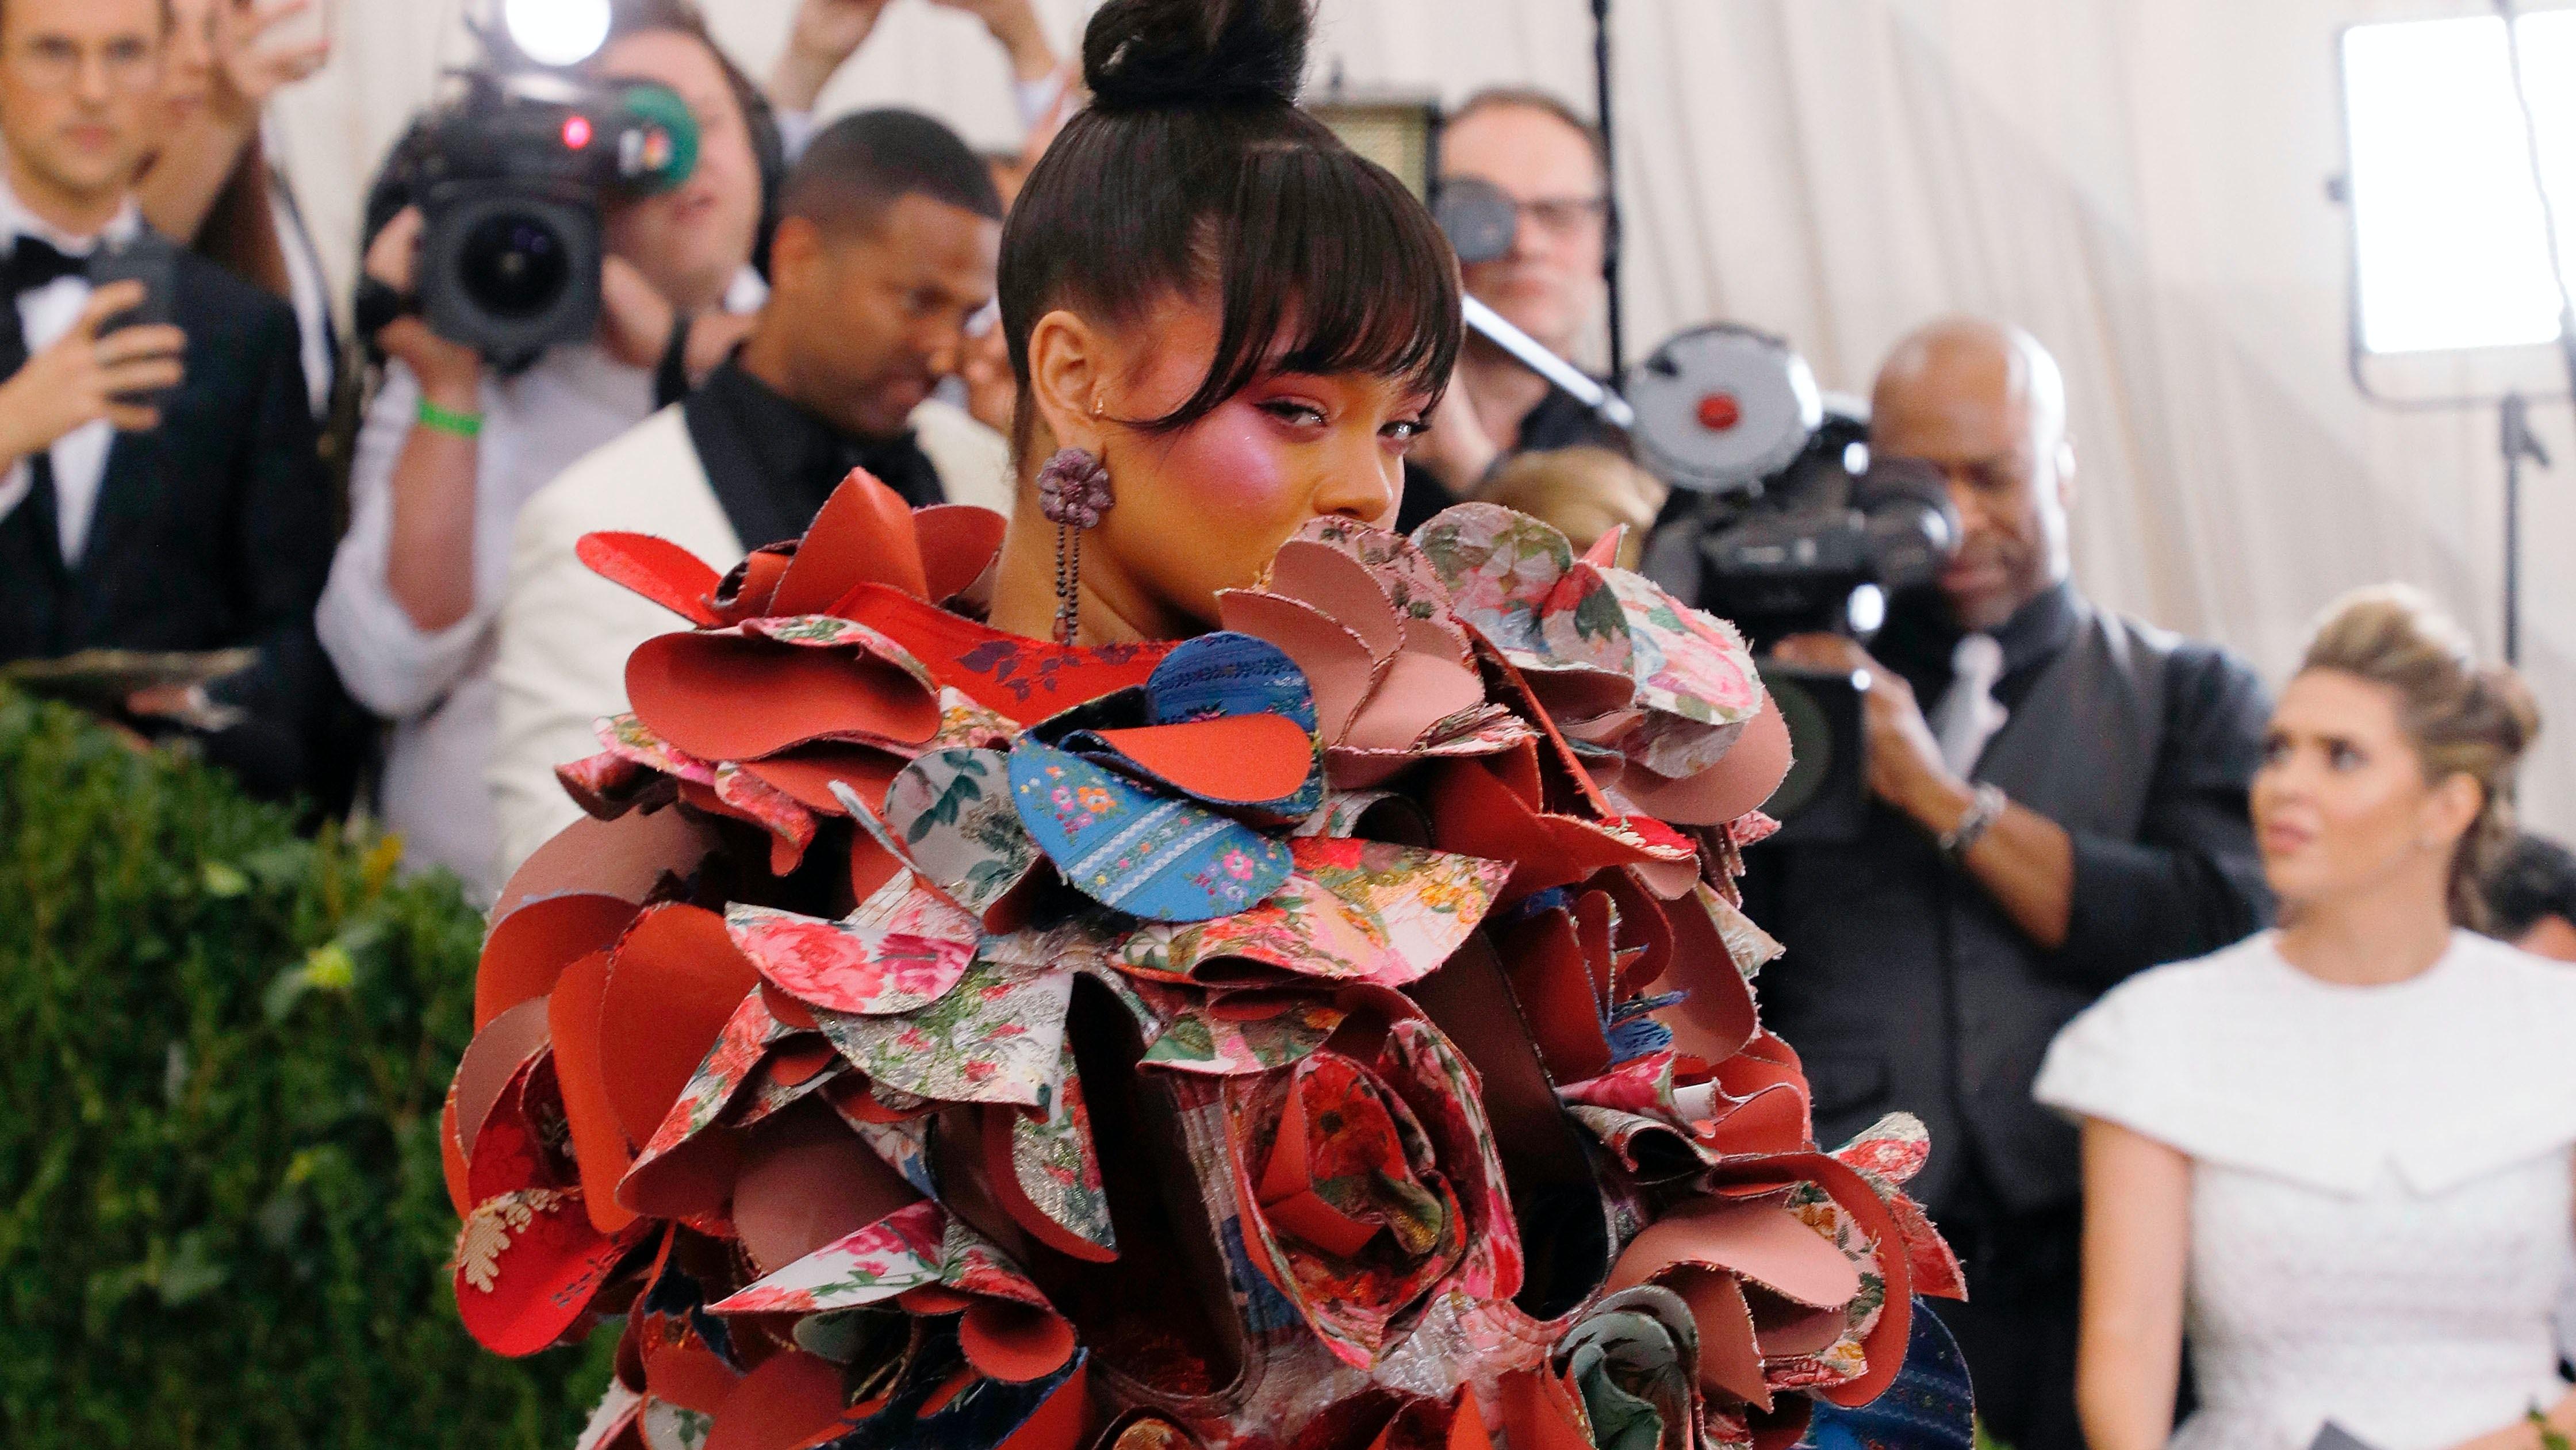 Rihanna at the Met Gala in Comme des Garçons   Source: Taylor Hill/FilmMagic